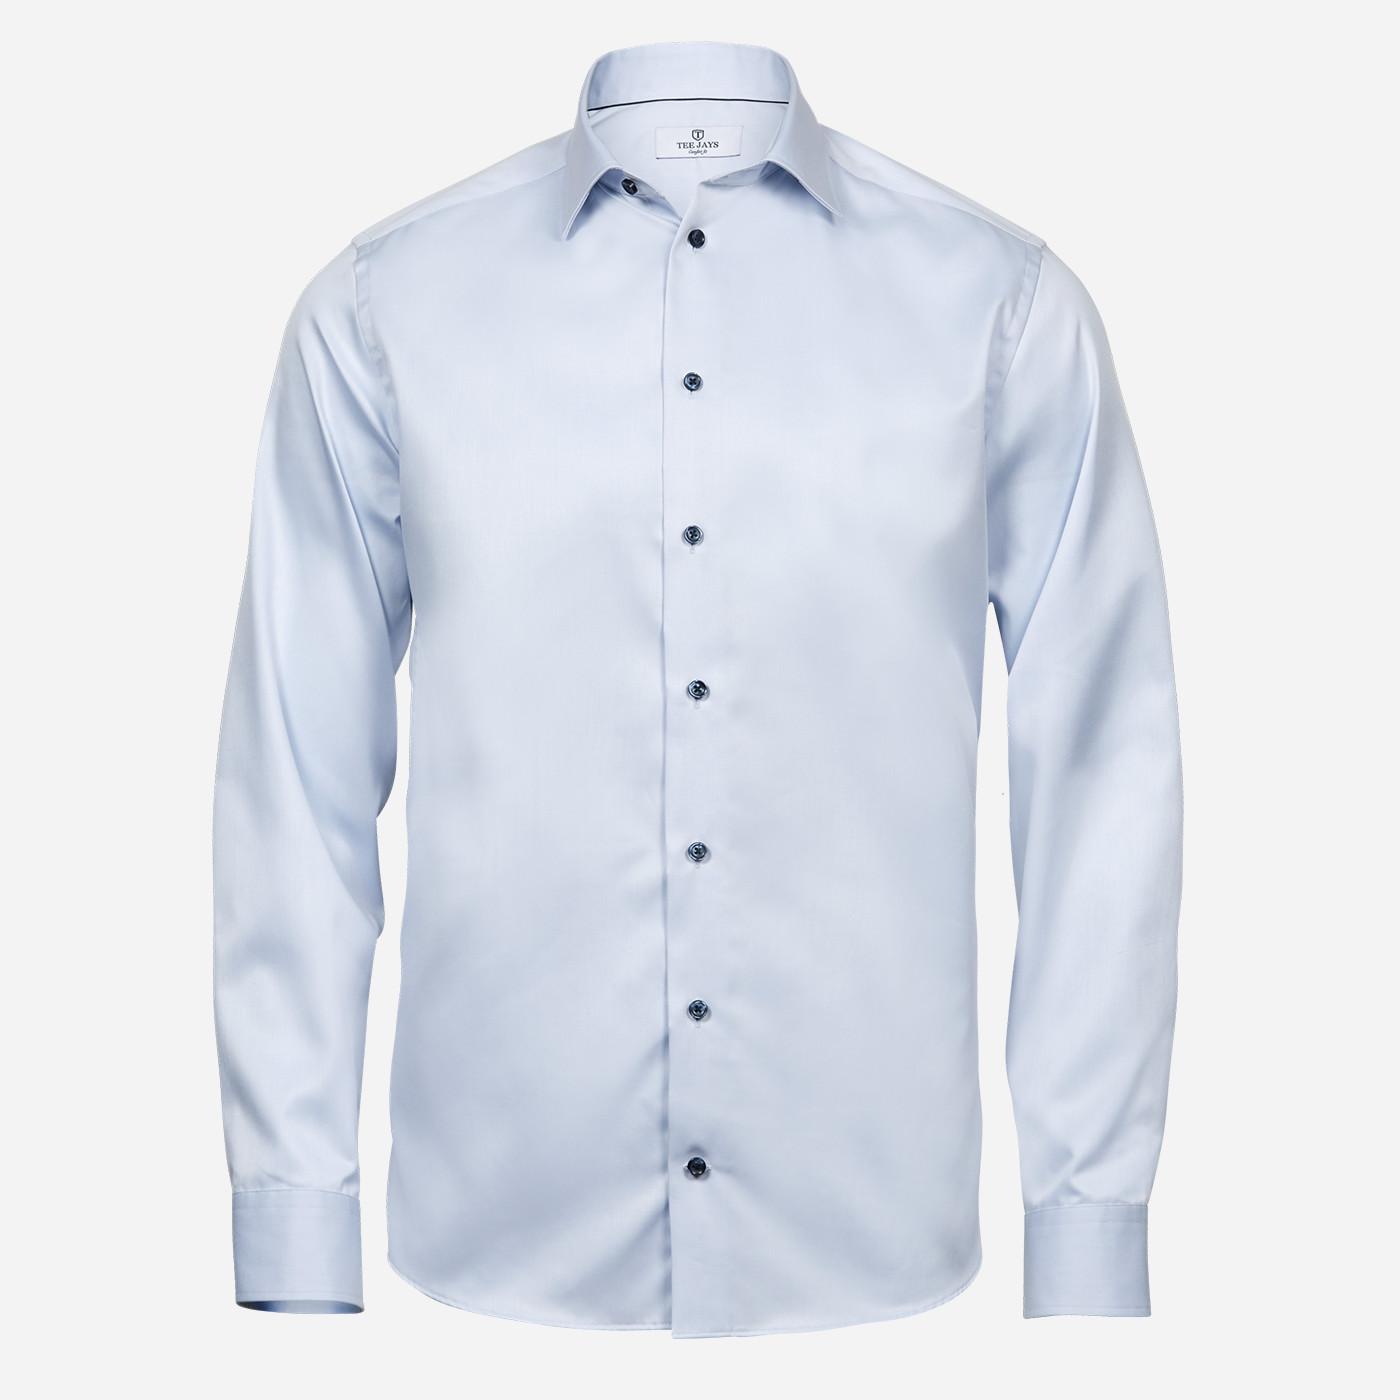 Svetlomodrá košeľa Tee Jays, 2-ply, Regular fit Veľkosť: XXL 45/46